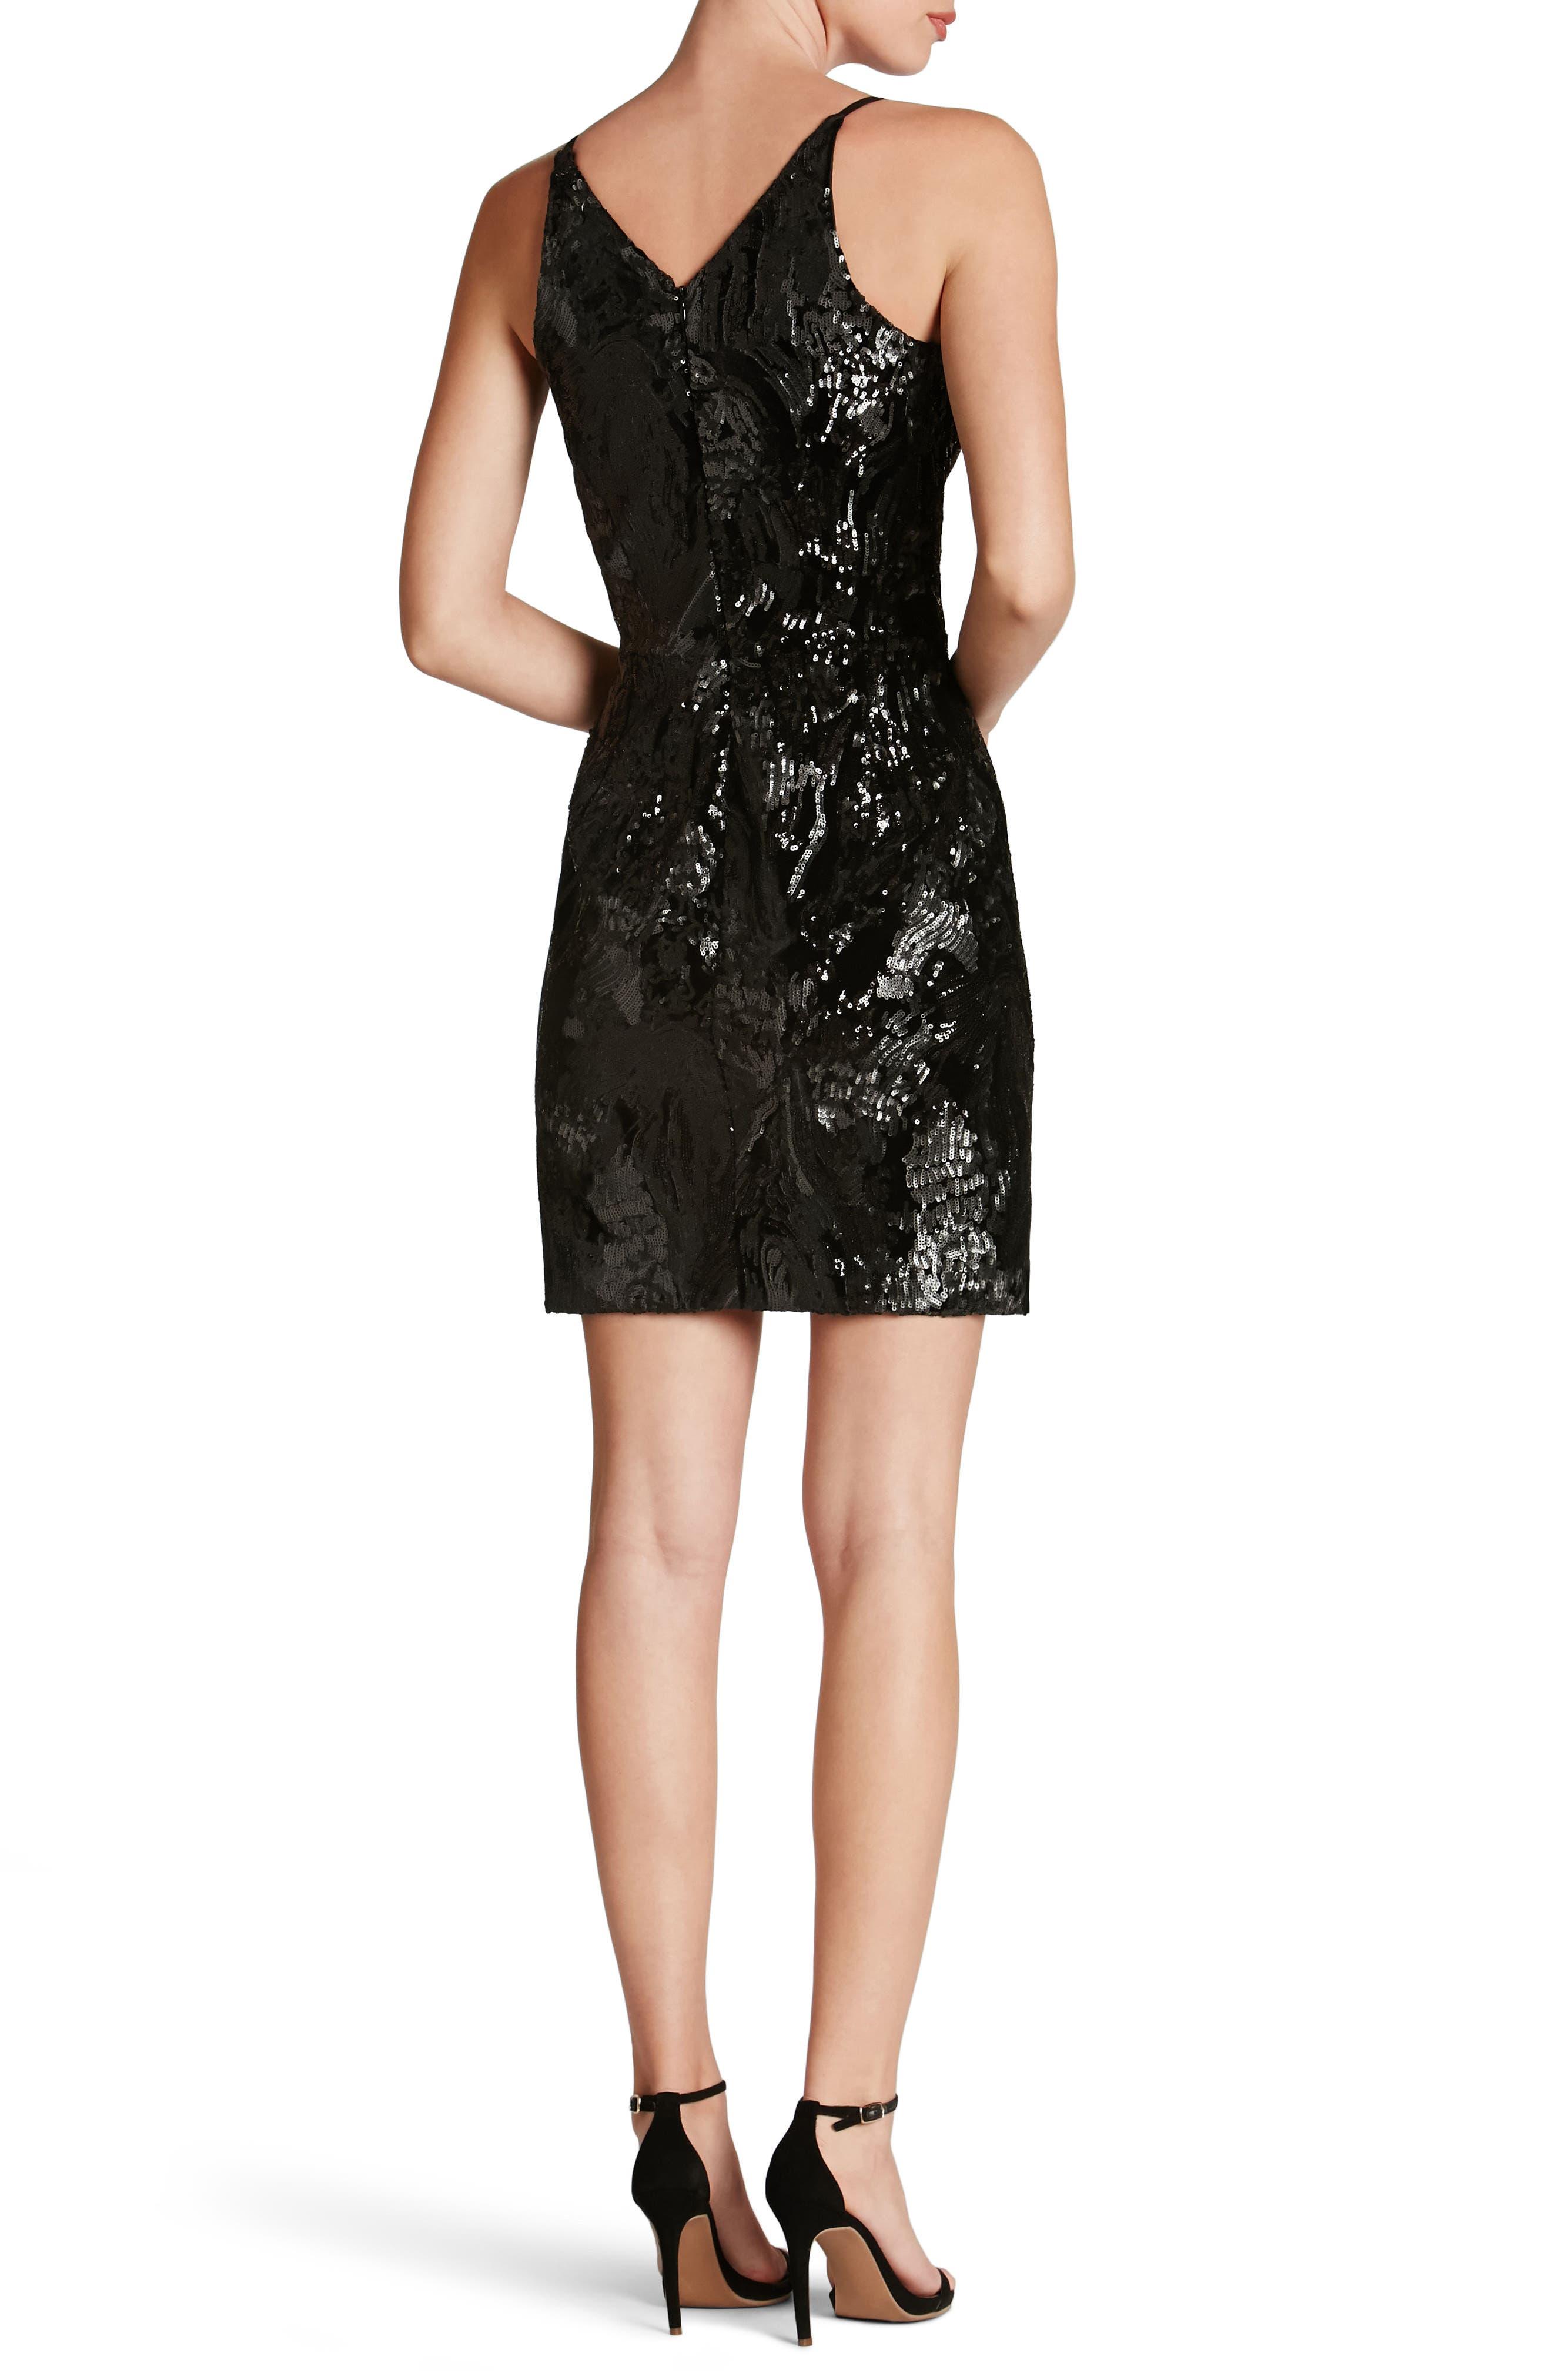 Jordyn Plunge Sequin Body-Con Dress,                             Alternate thumbnail 2, color,                             015